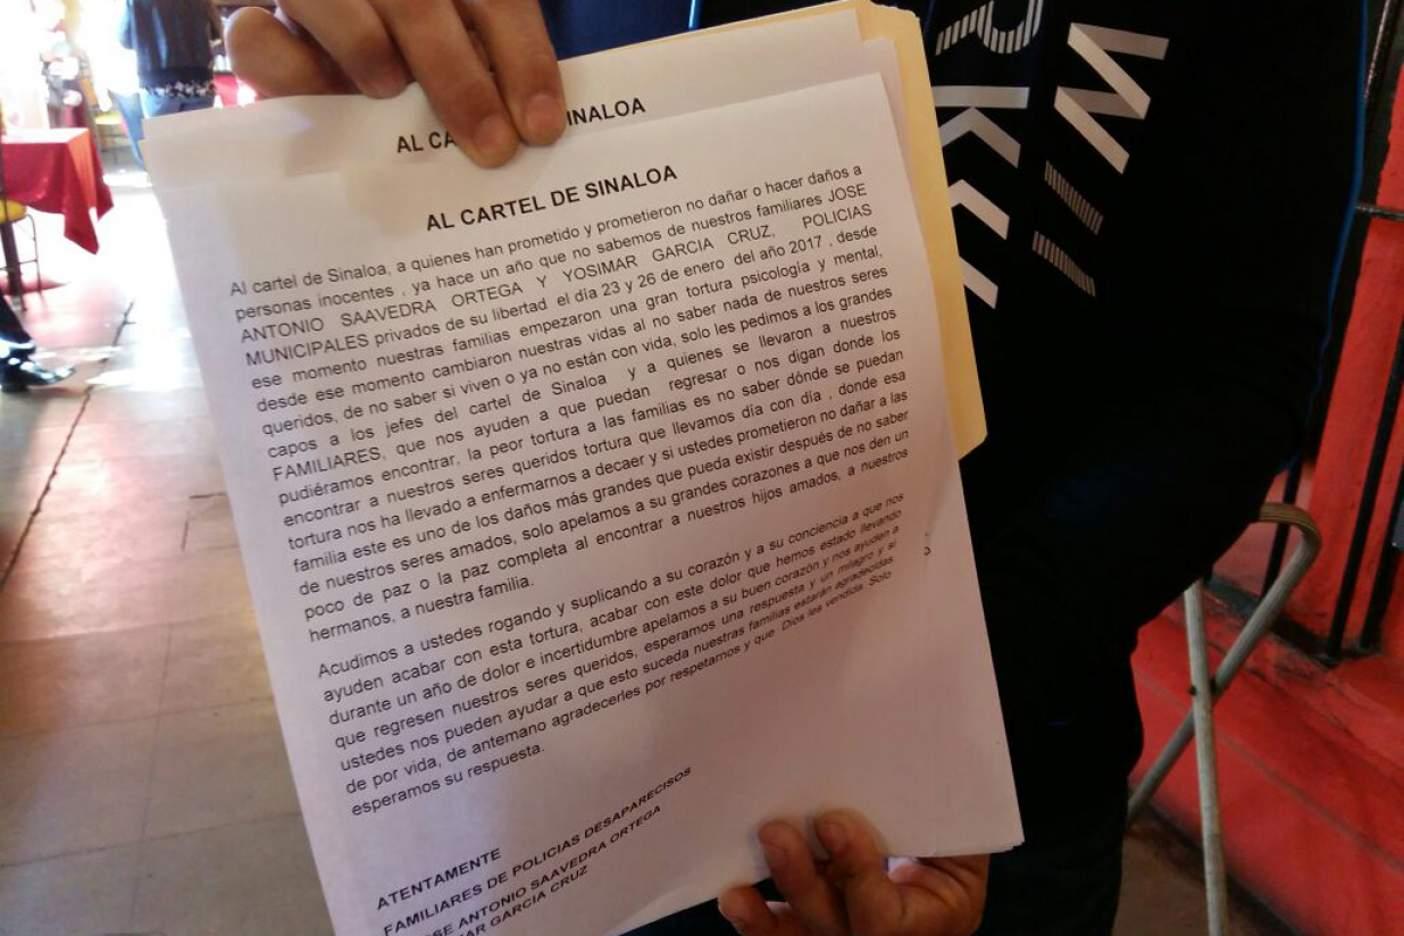 Suplican ayuda a cártel de Sinaloa para localizar a policías desaparecidos